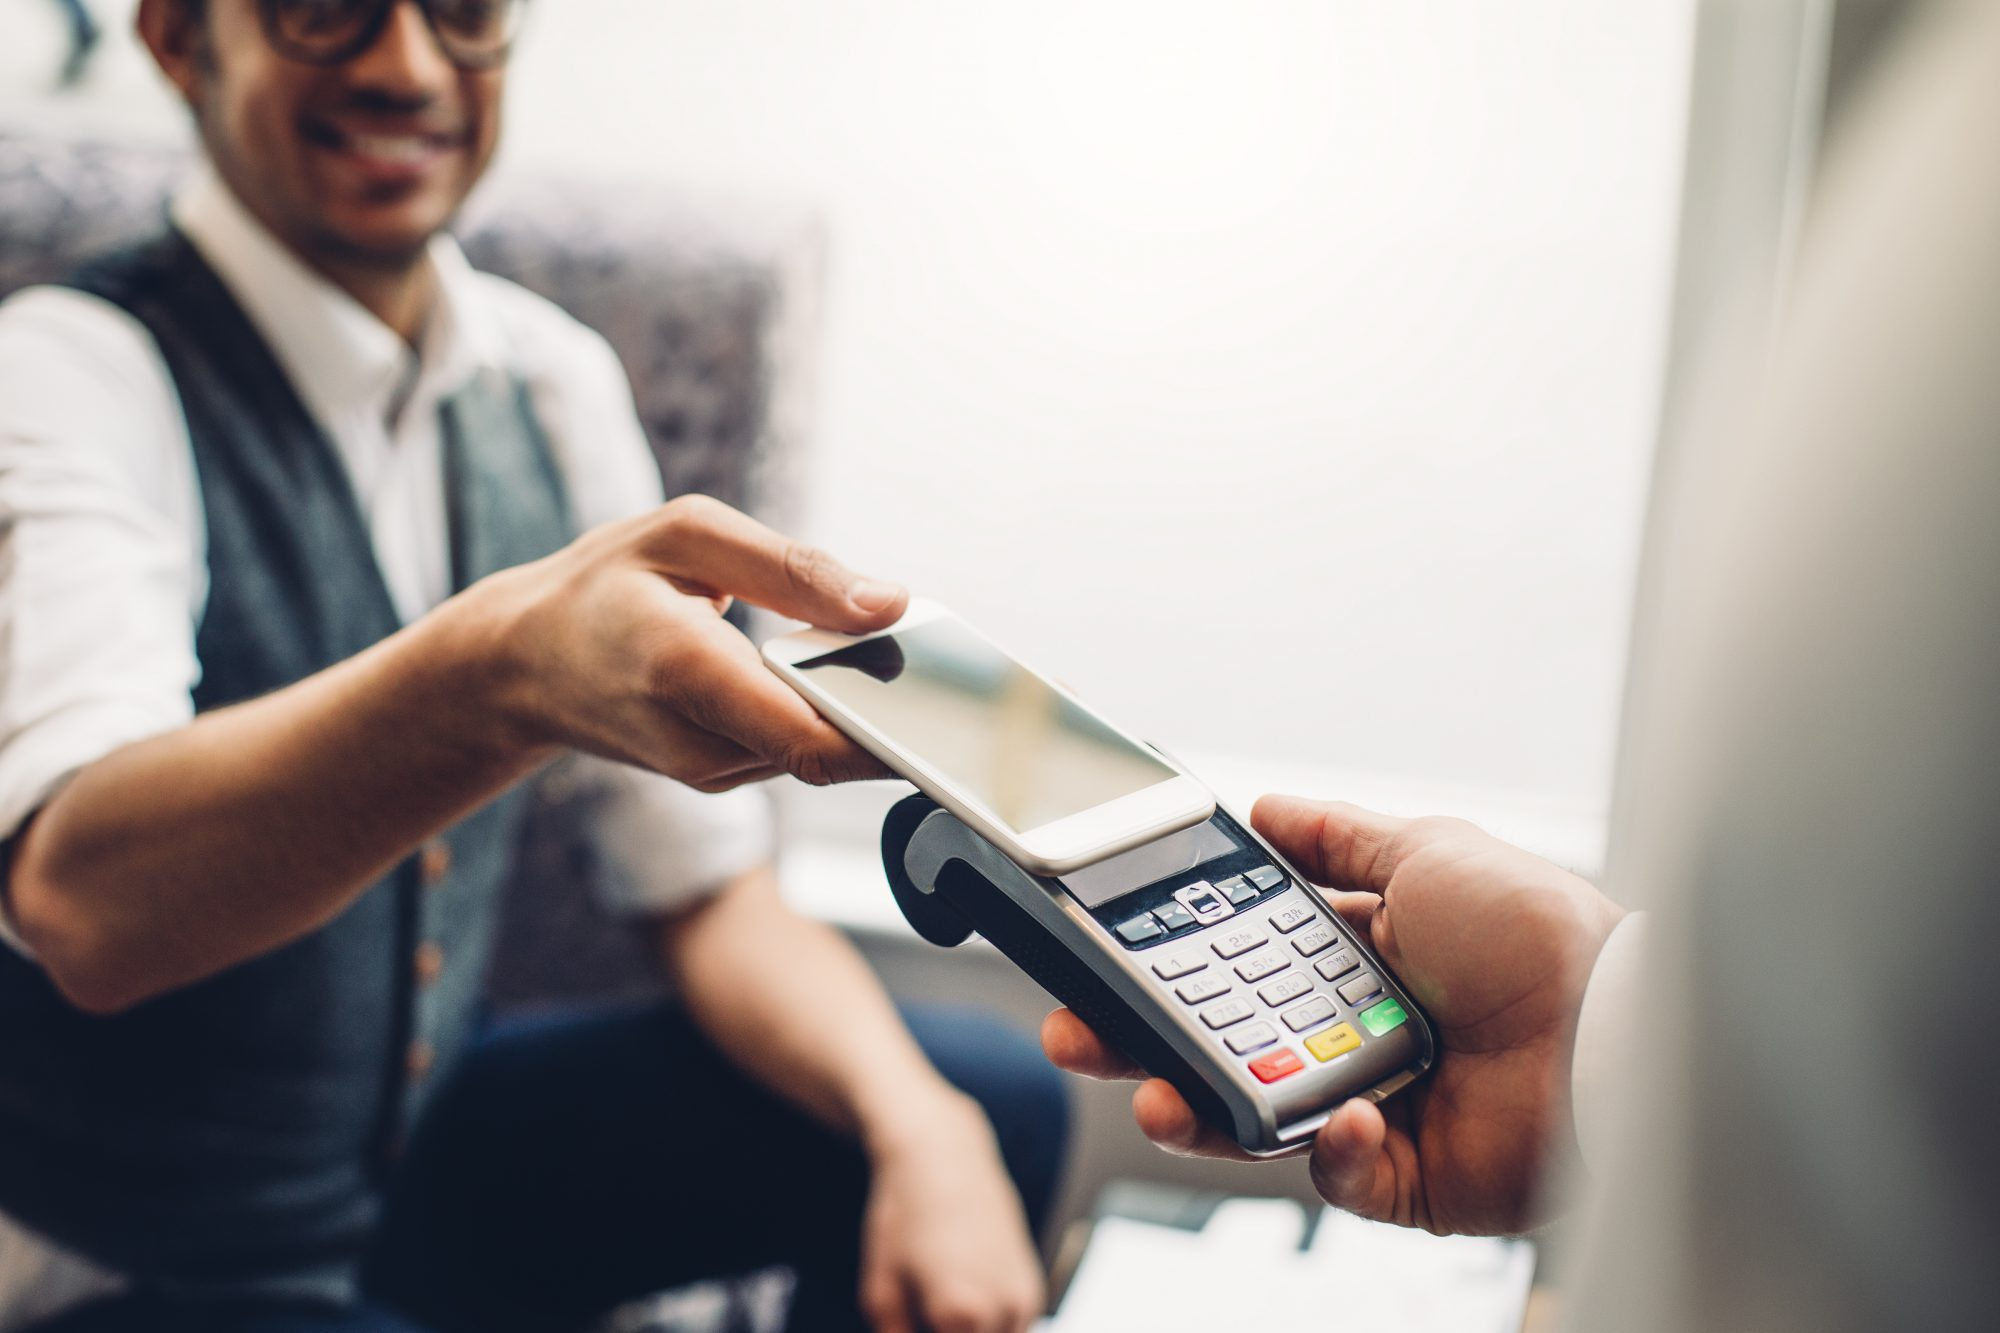 「LINE Pay」のグローバル利用が増大!日本でのキャッシュレス社会へのトリガーとなるか